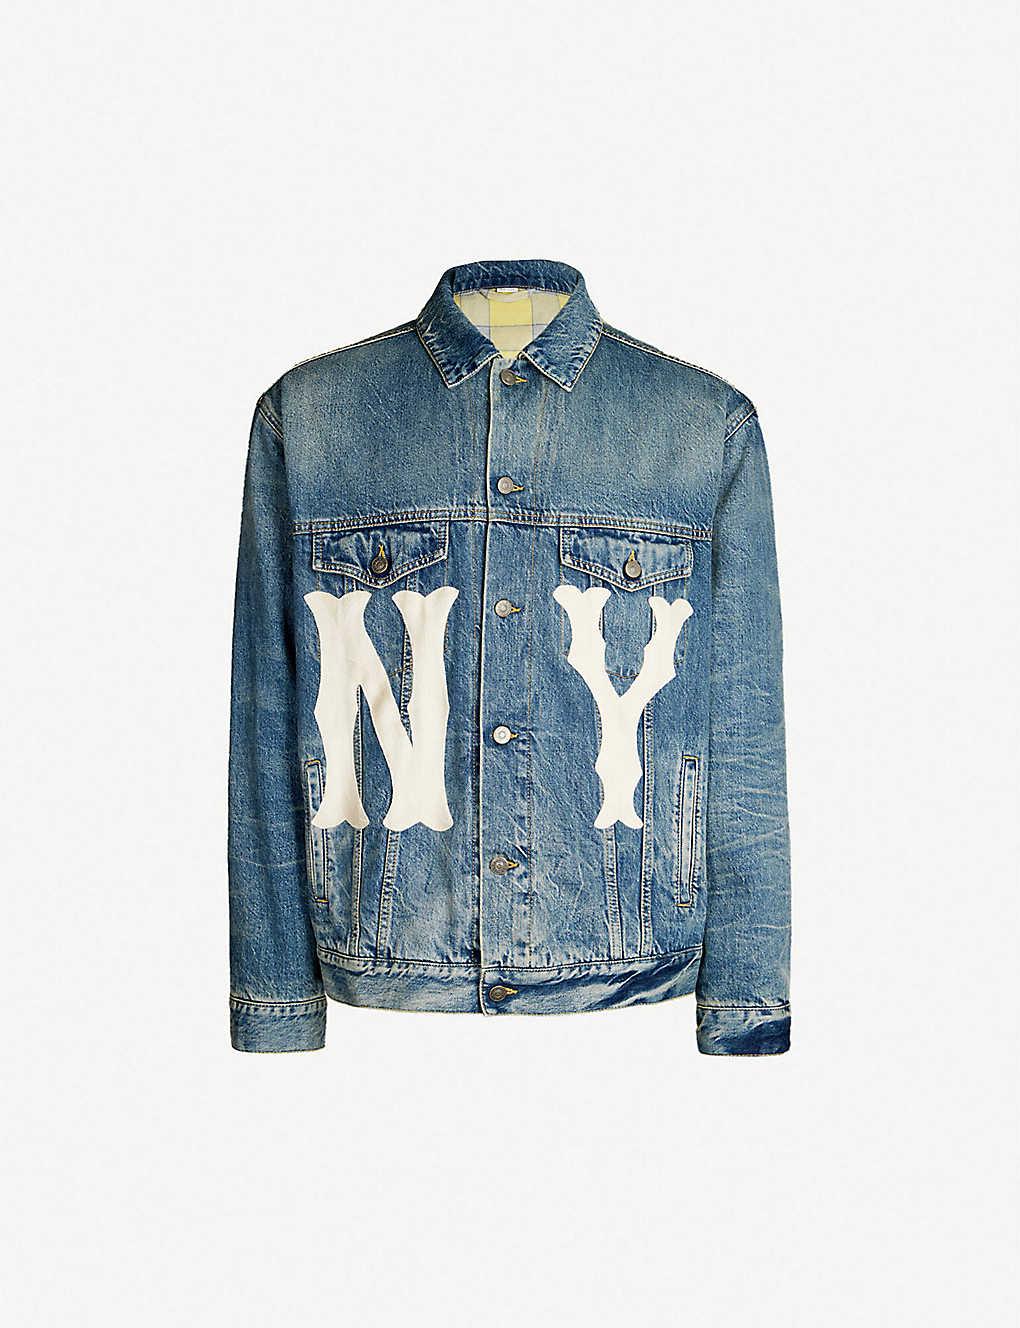 3e716677 GUCCI - NY Yankees™ patch denim jacket | Selfridges.com